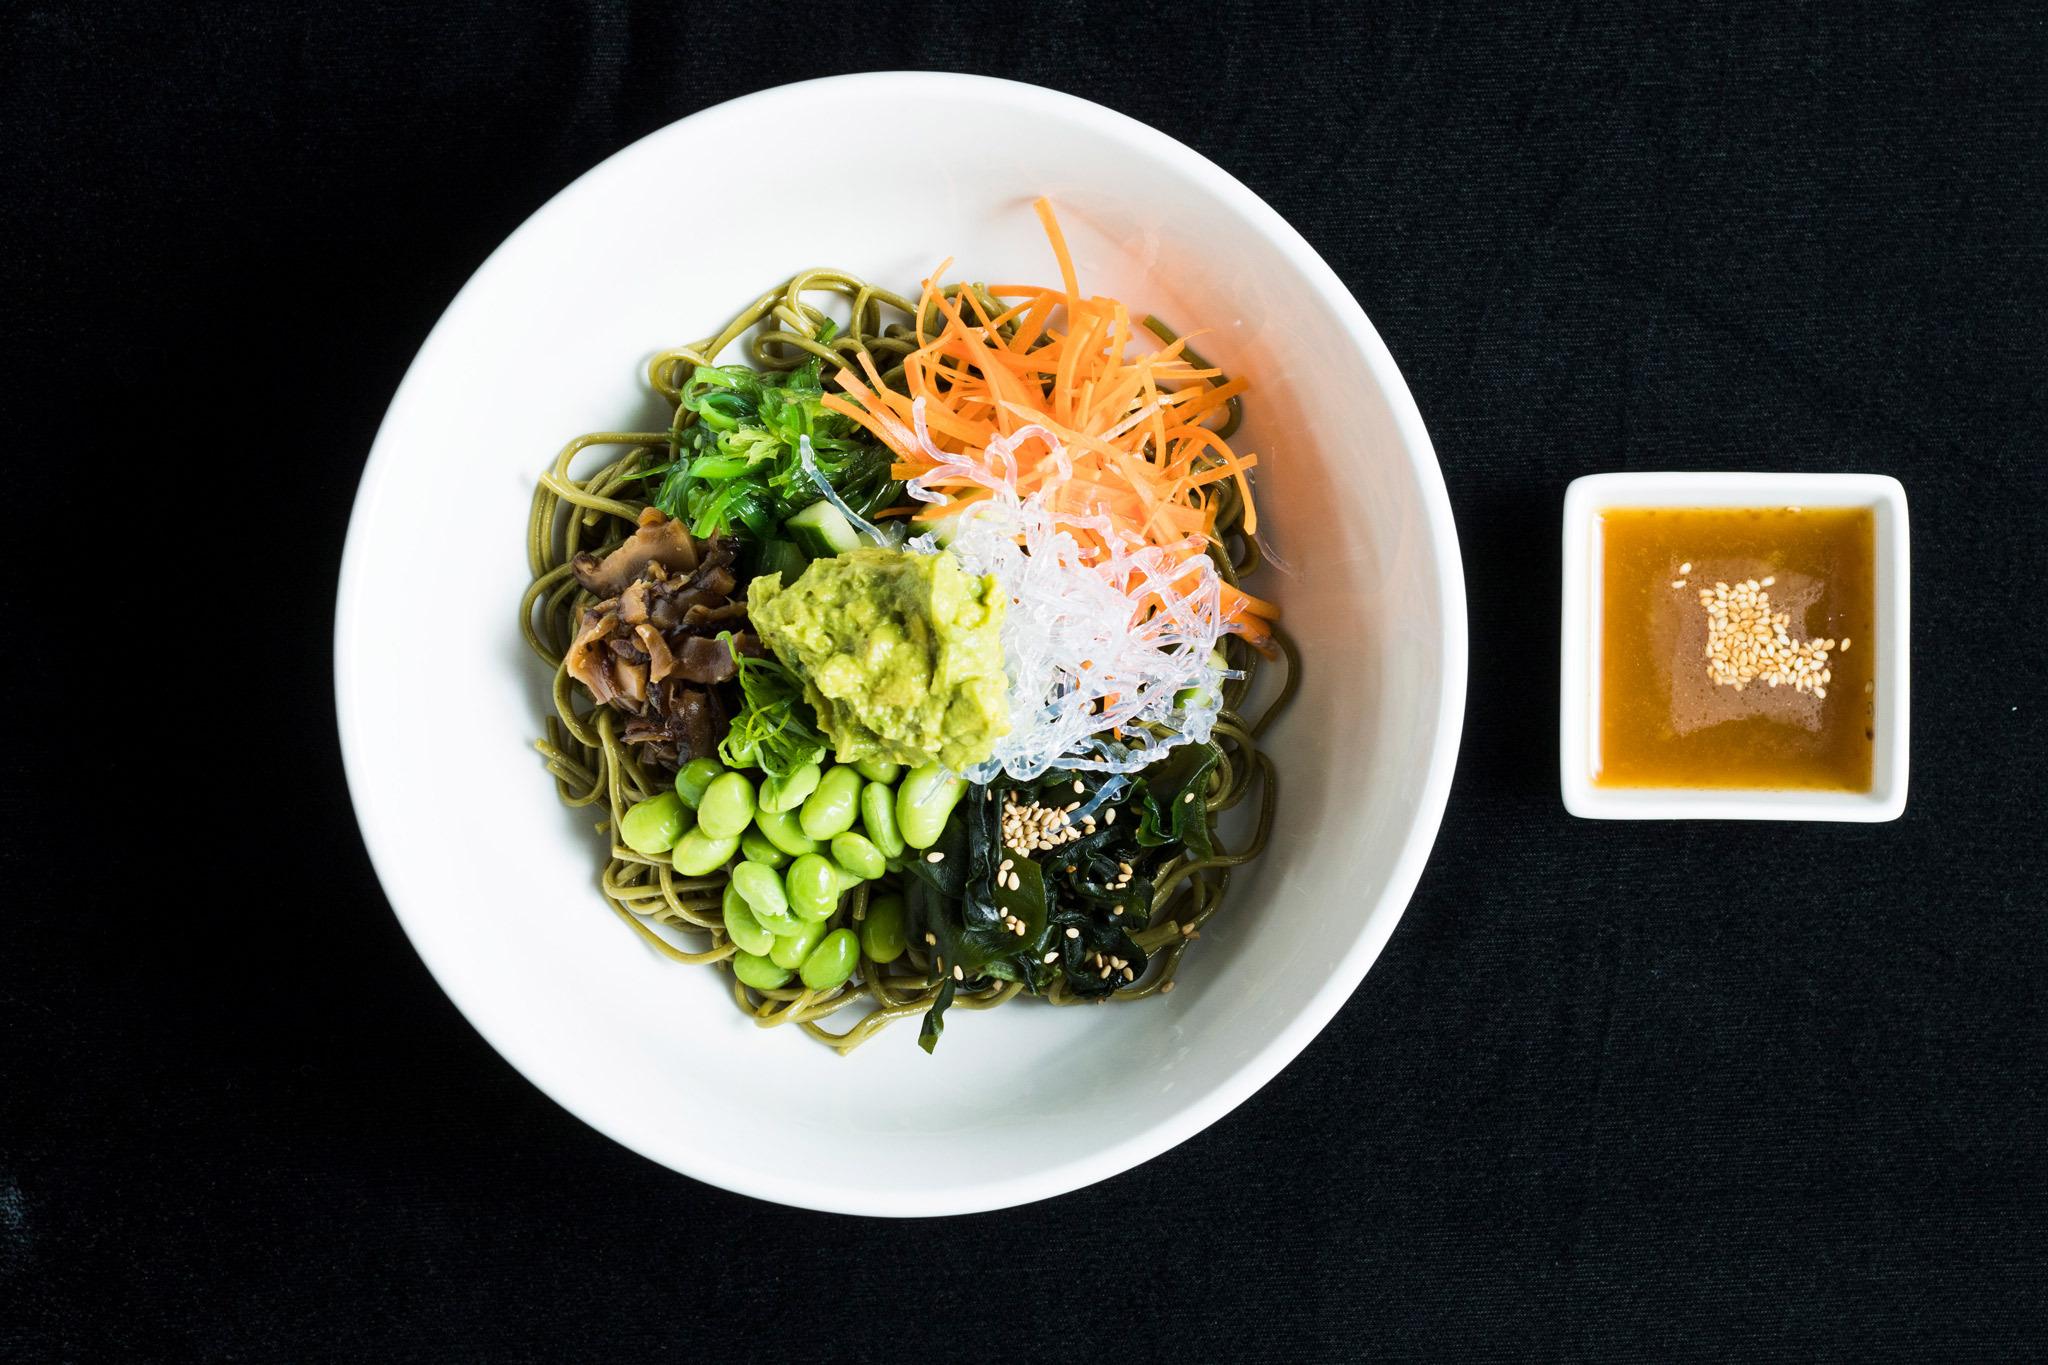 Food Envy: Yasai bowl at Wabi Sabi by Shuji